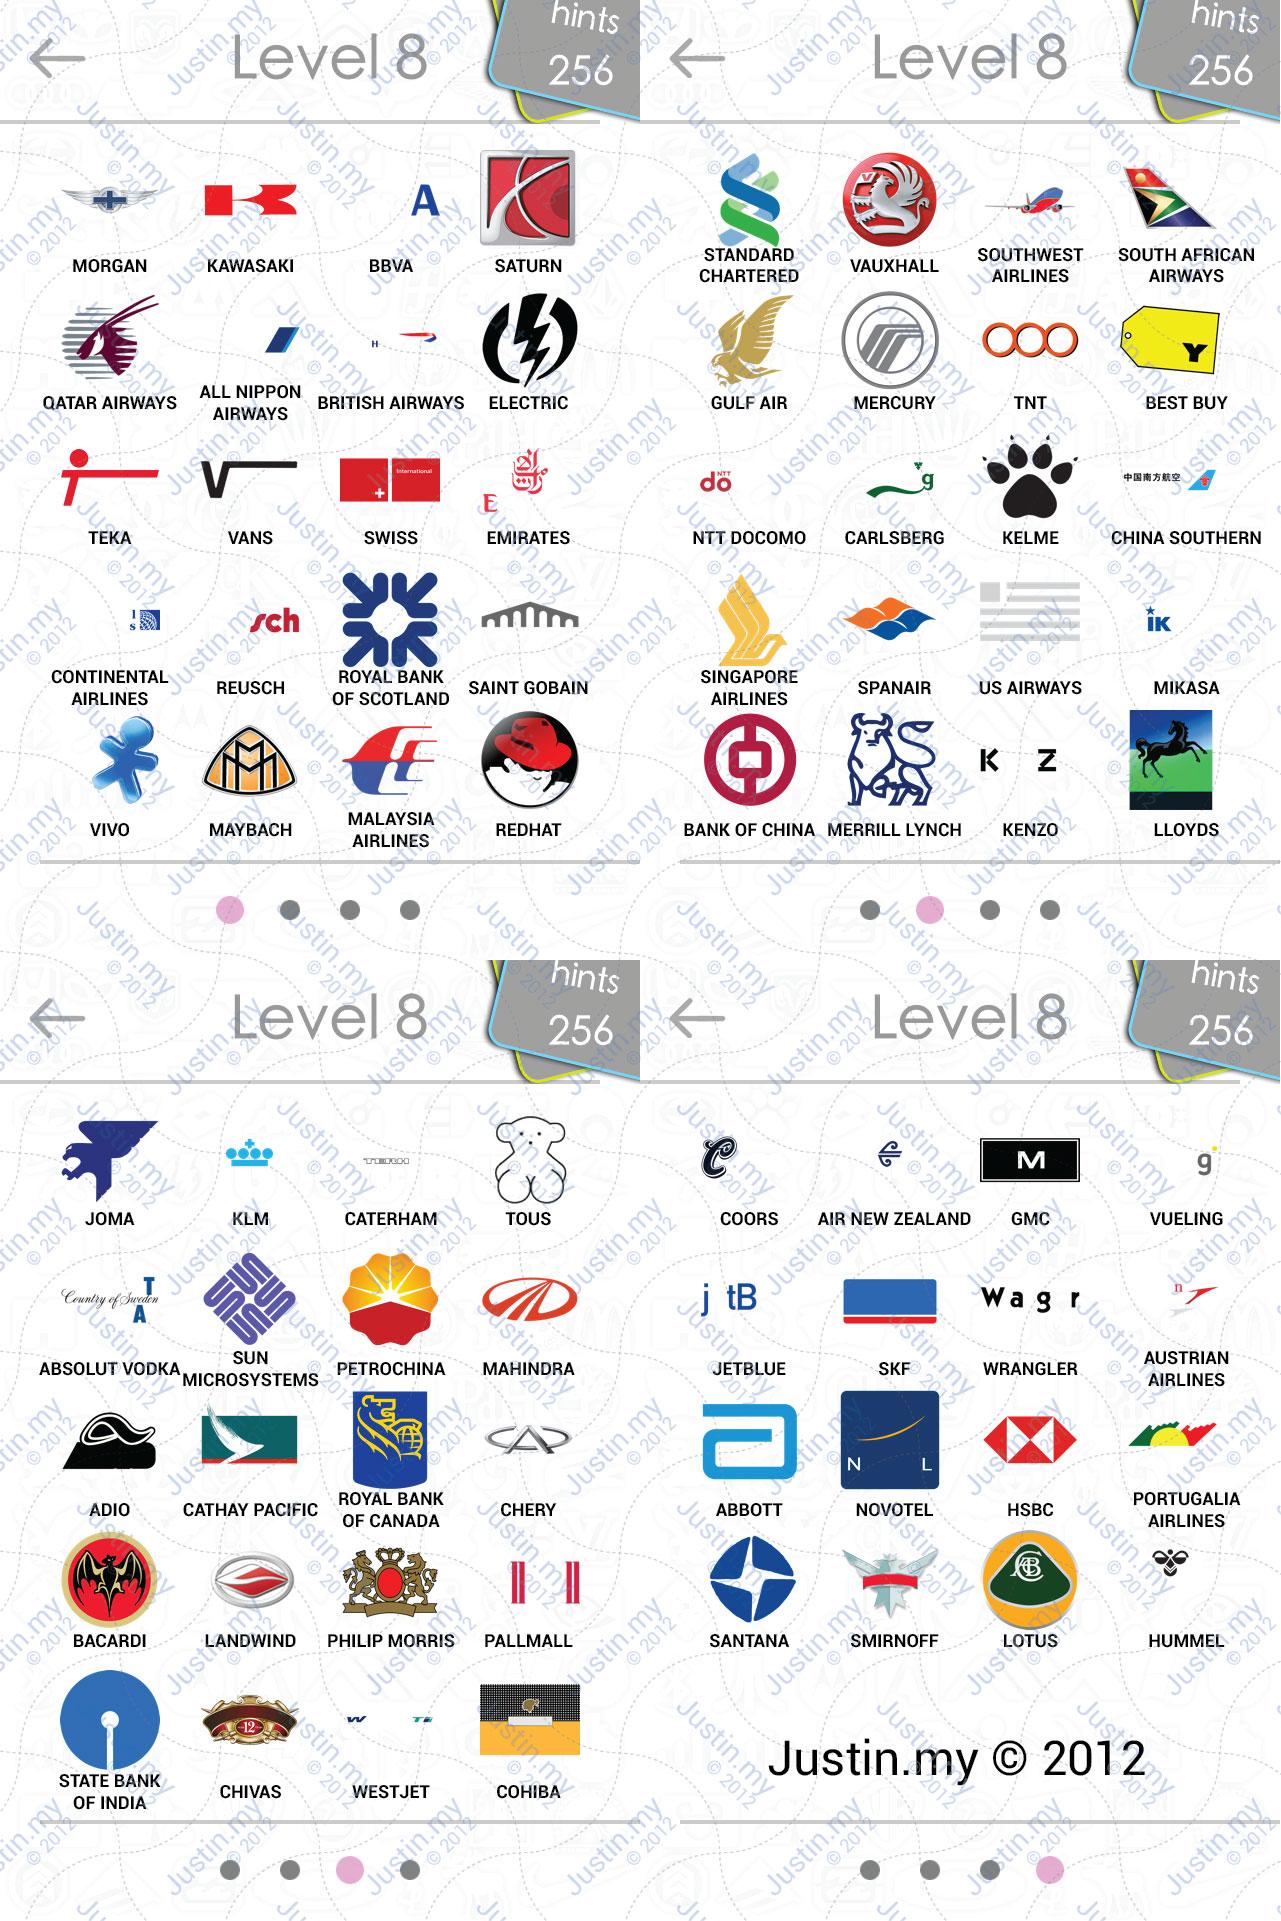 Level 10 logos quiz level 11 logos quiz level 12